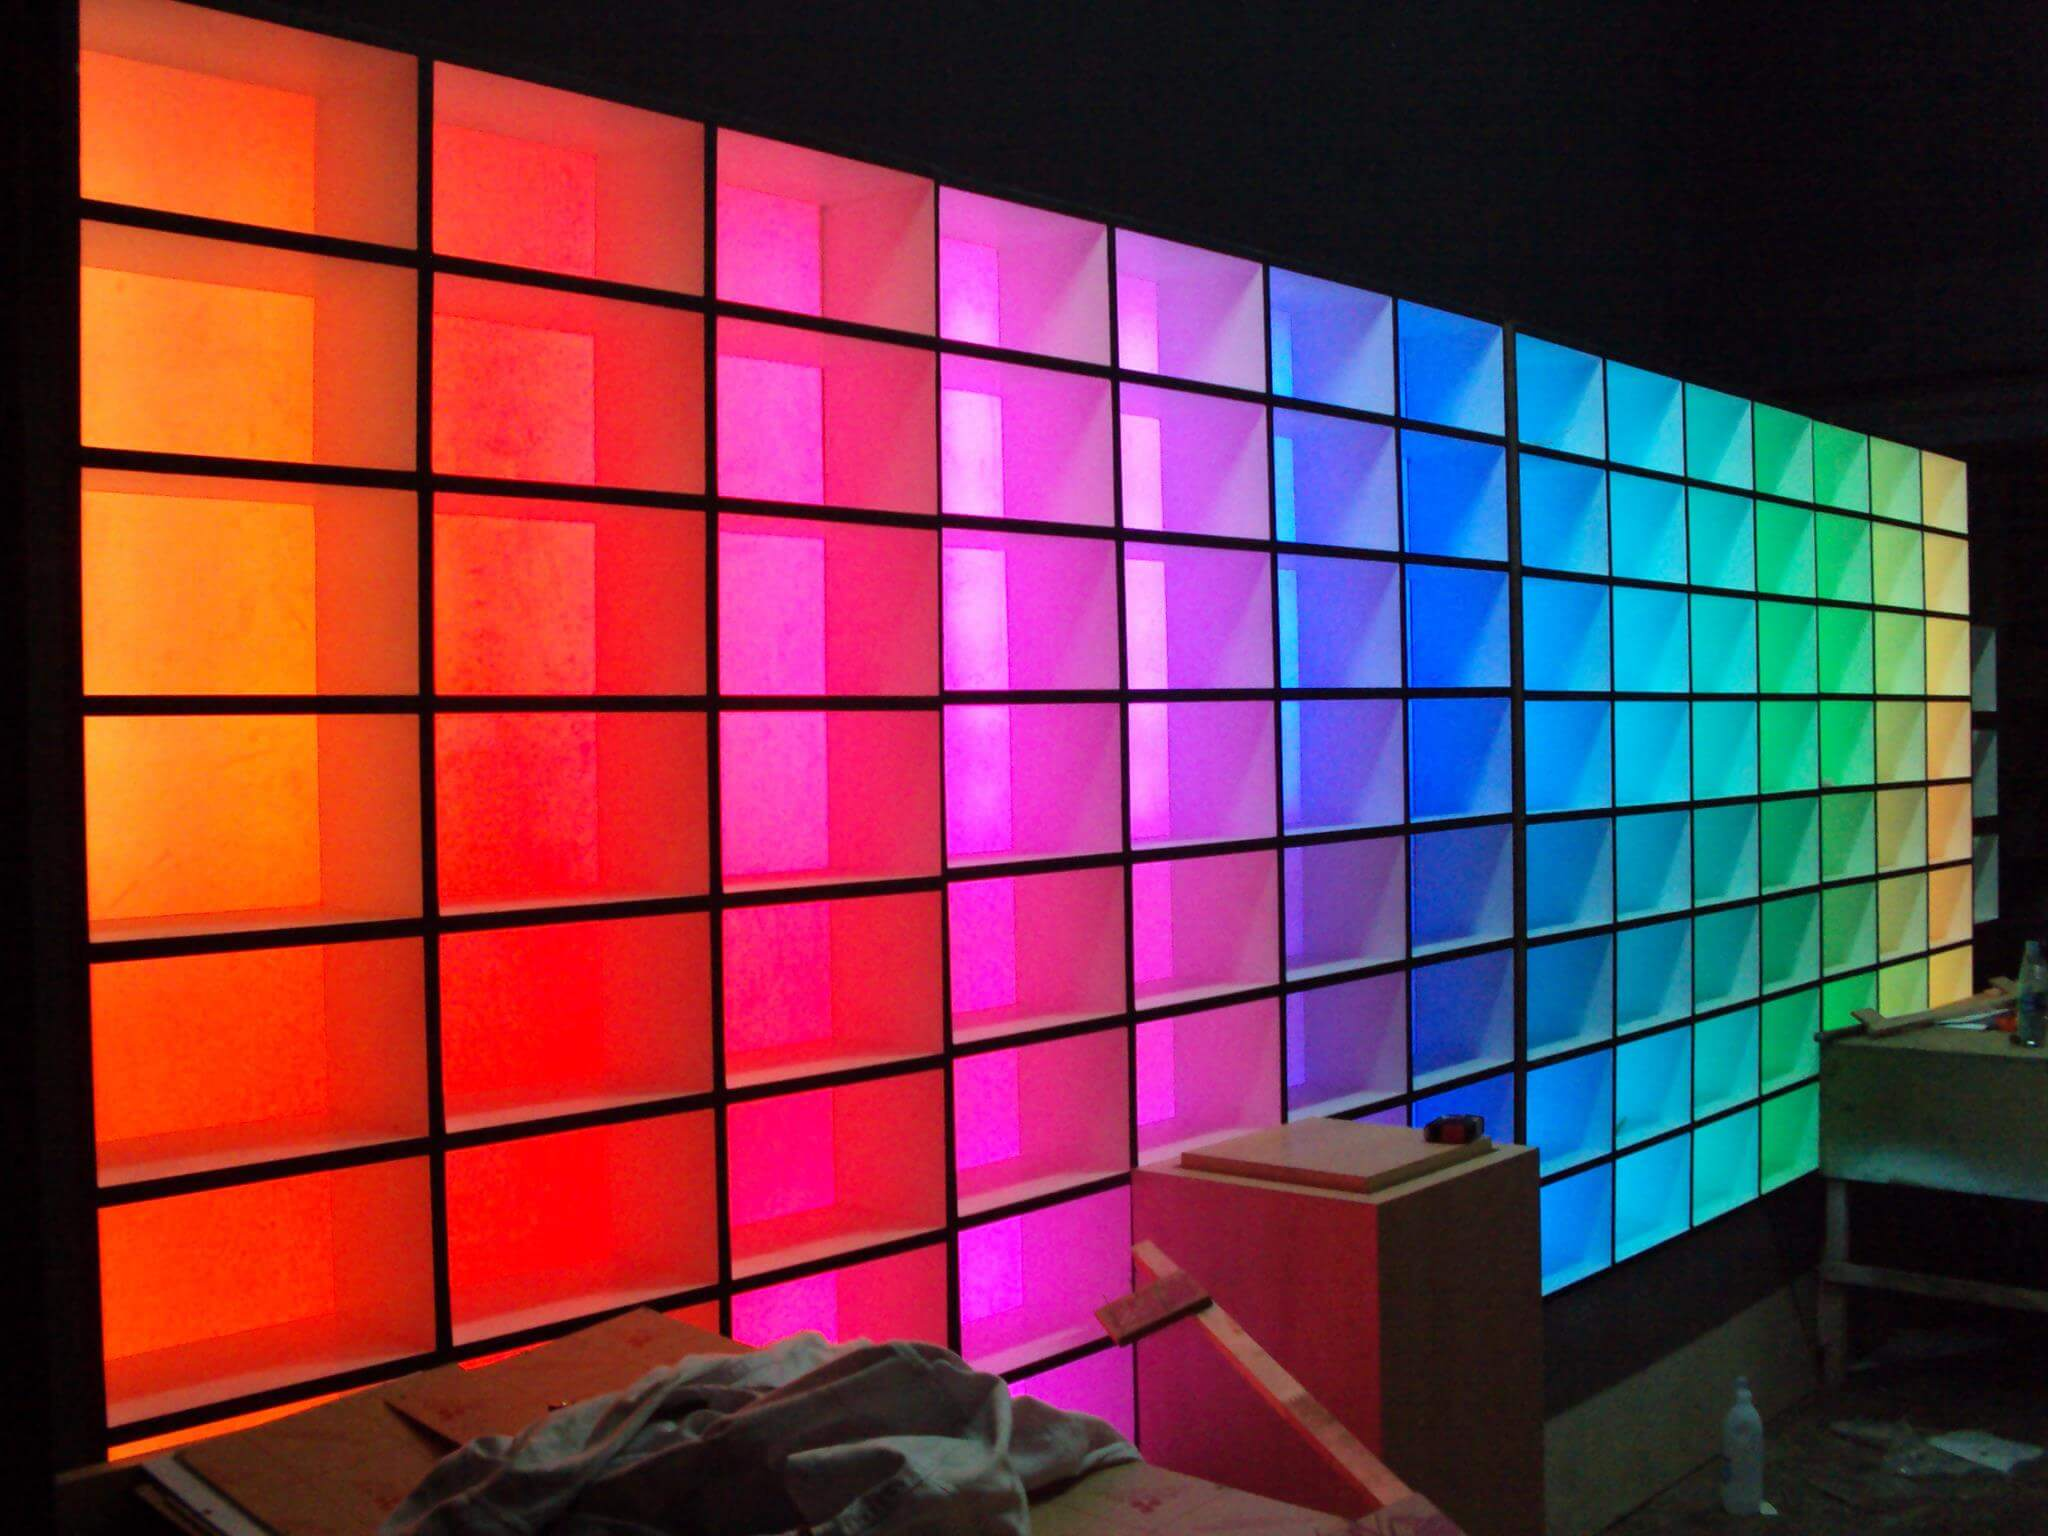 TYL Lighting Co.,Ltd ::ผู้นำไฟประดับ รับออกแบบและติดตั้งไฟ